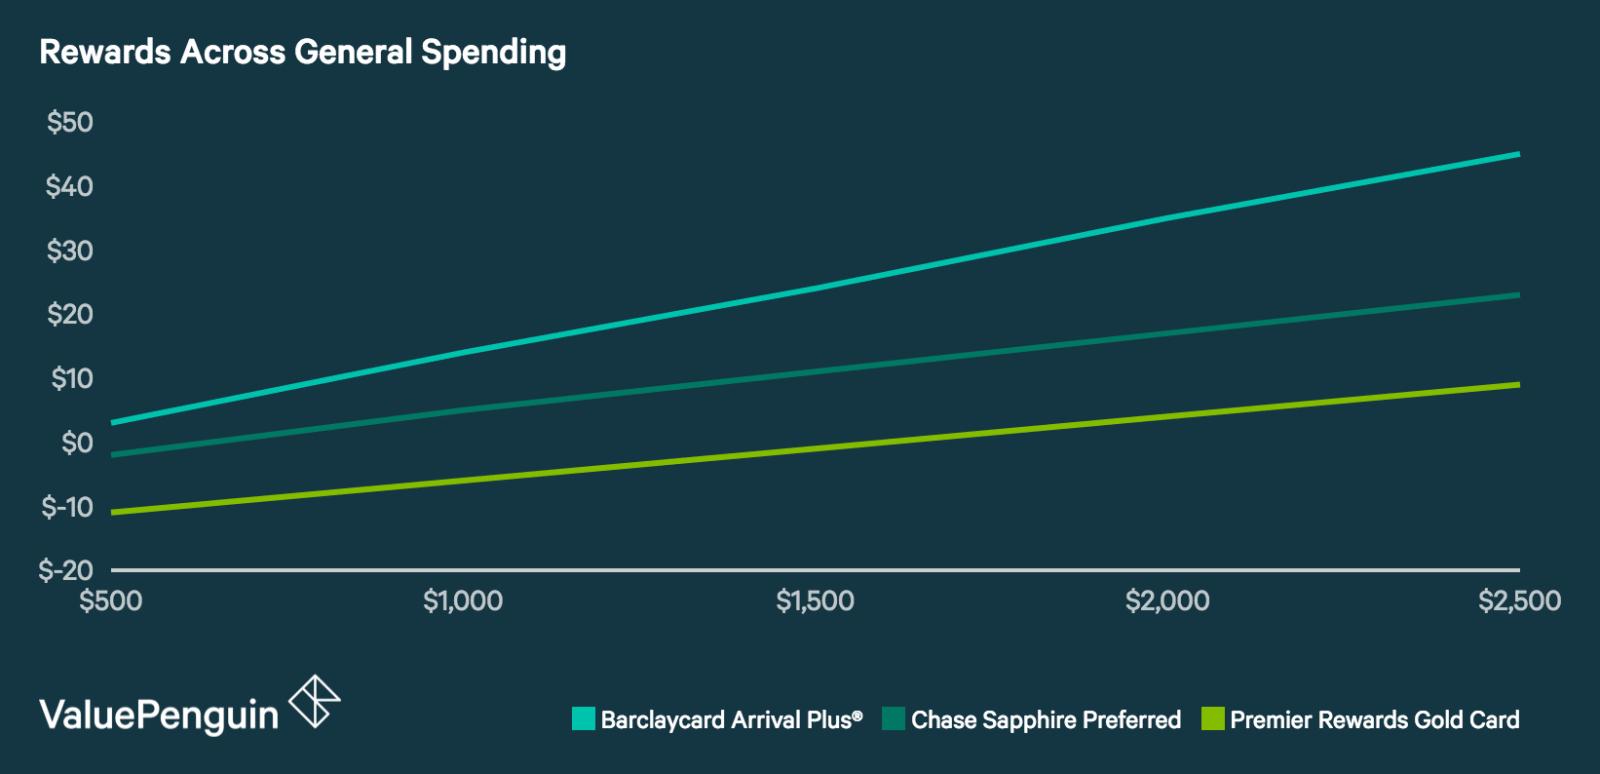 General Rewards Graph of Amex Gold Premier World vs Barclays Arrival Plus vs Chase Sapphire Preferred